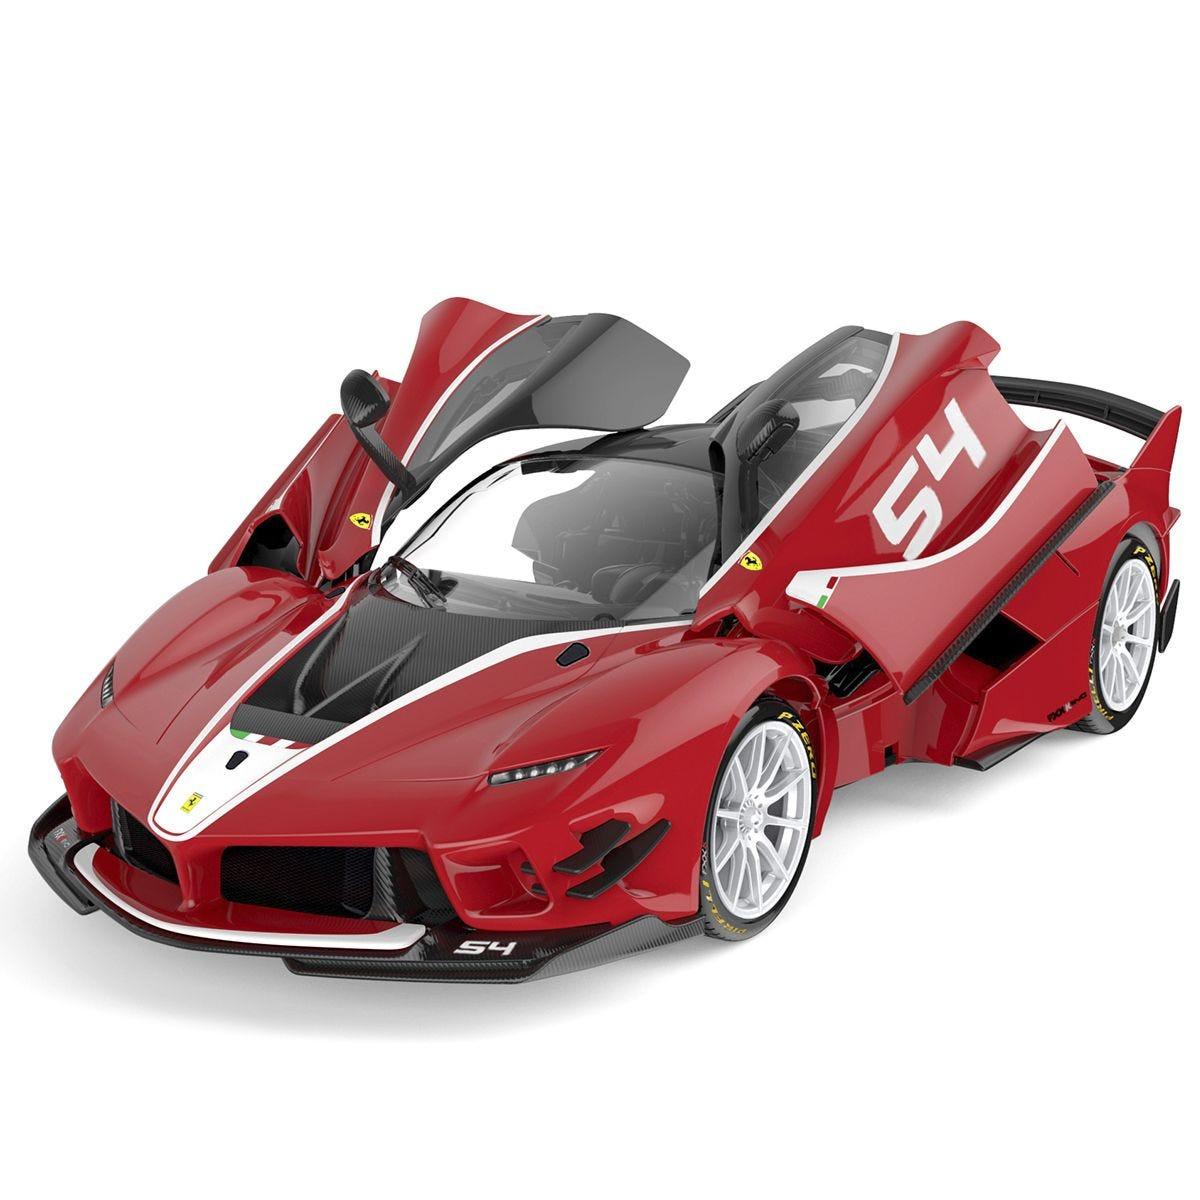 Rastar Remote Control 1 14 Ferrari Fxxk Evo Red Robert Dyas